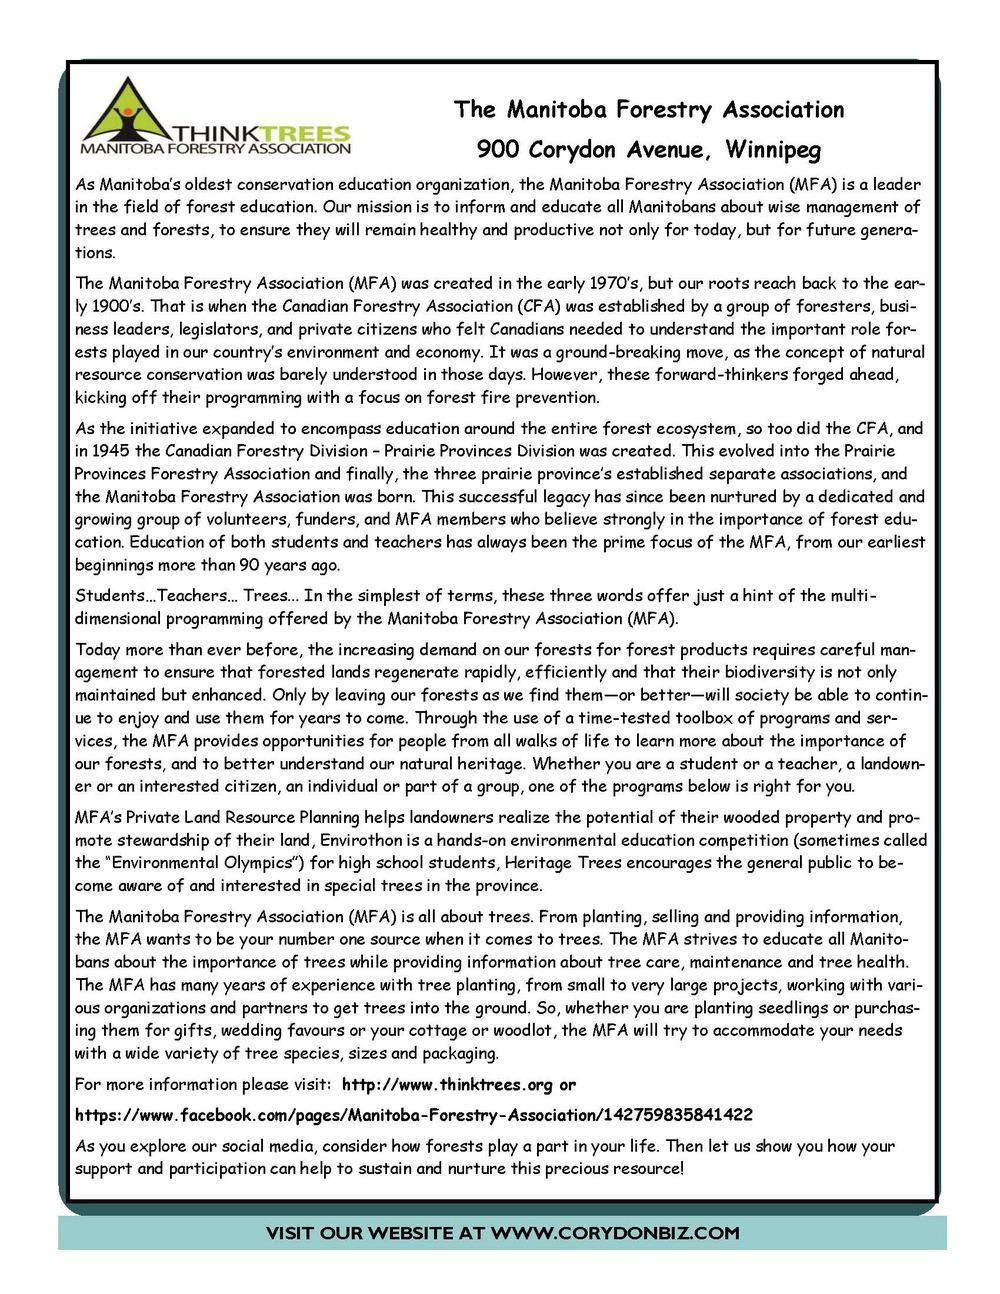 2015 - Corydon BIZ  Newsletter_Page_5.jpg